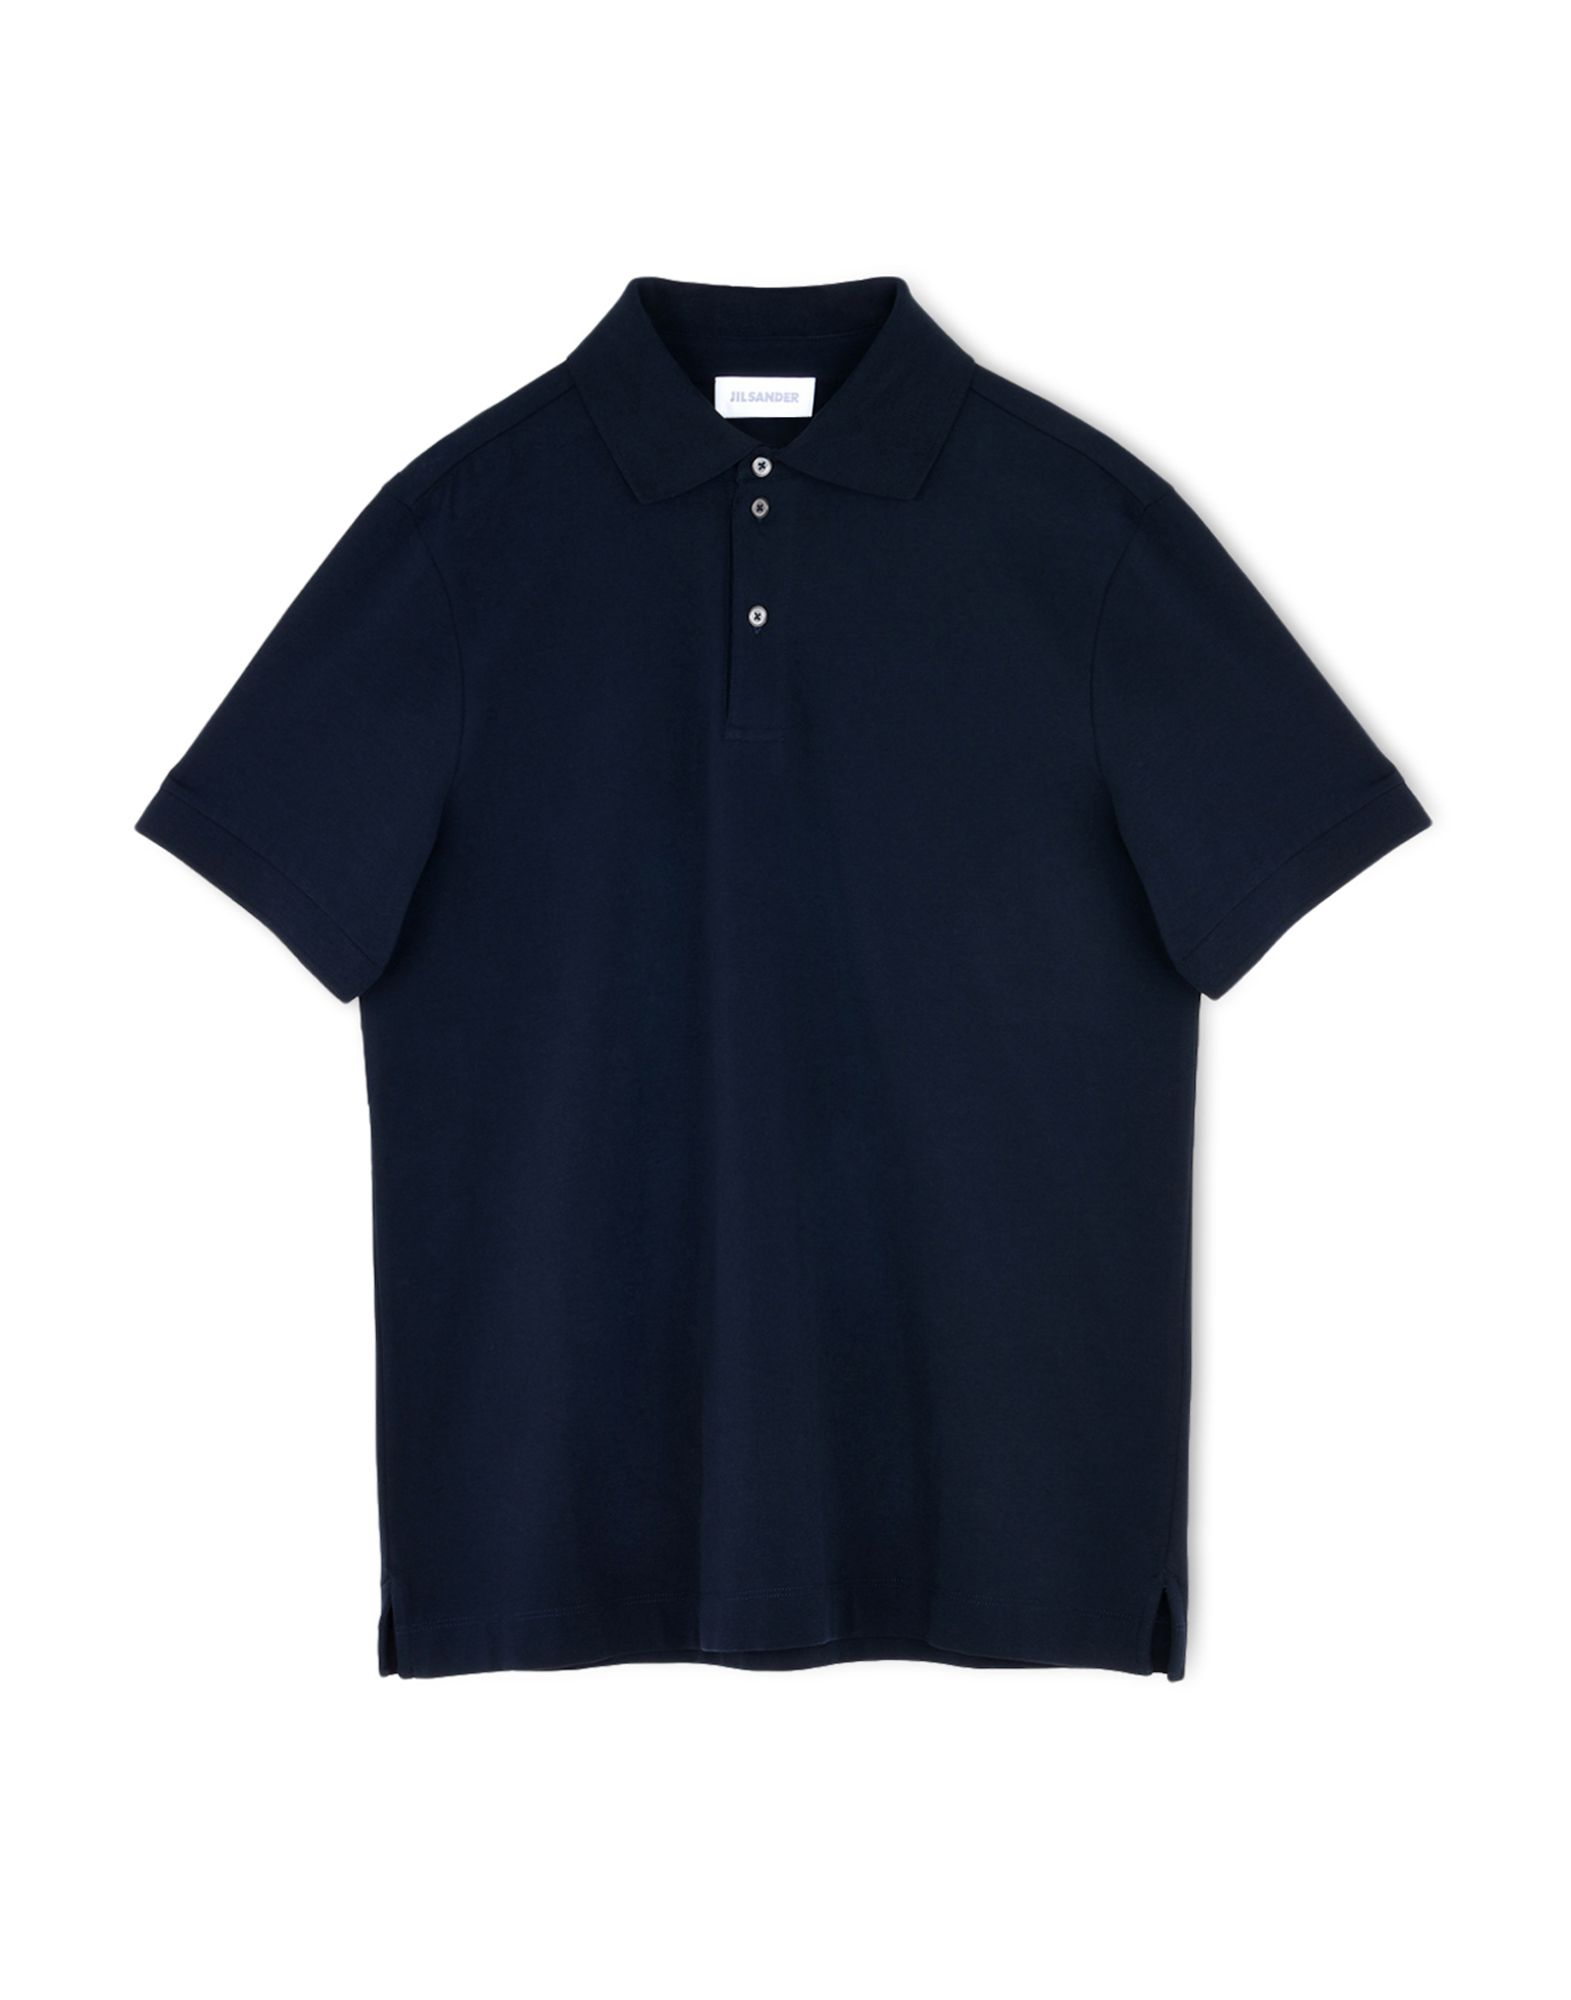 Polo - JIL SANDER Online Store